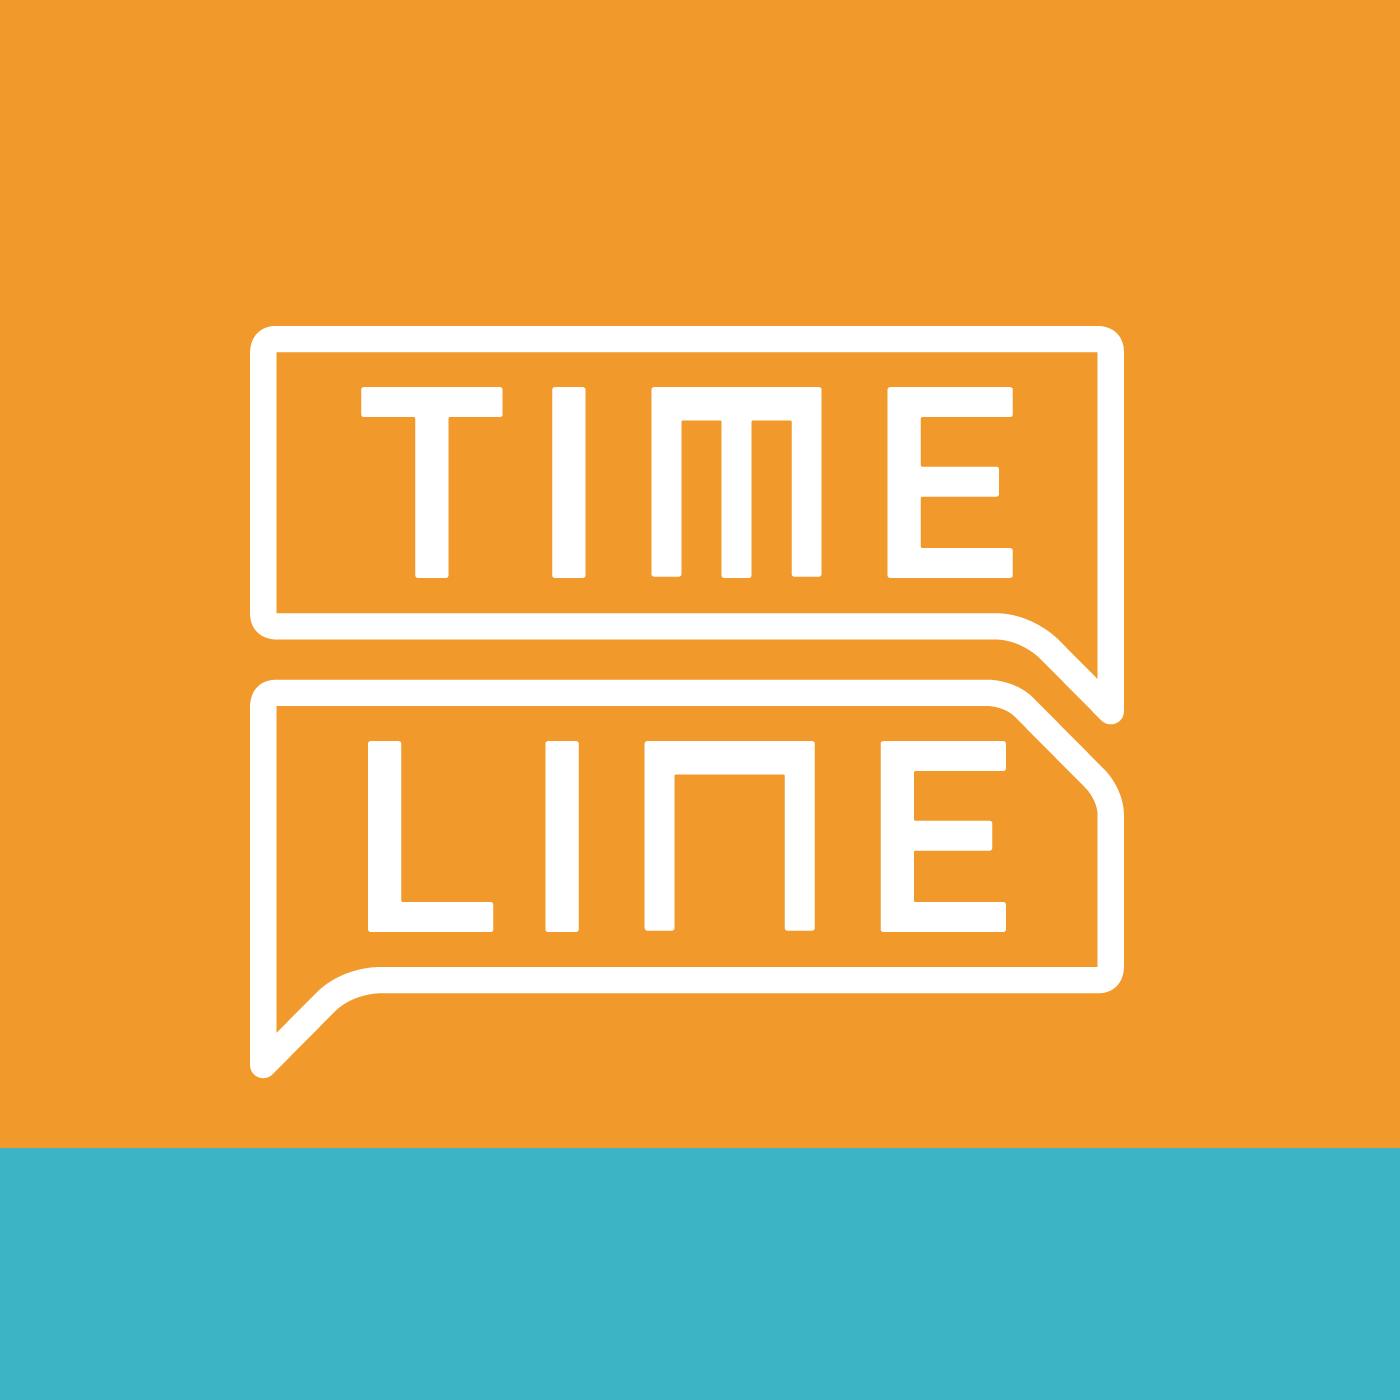 Timeline Gaúcha 30/03/2017